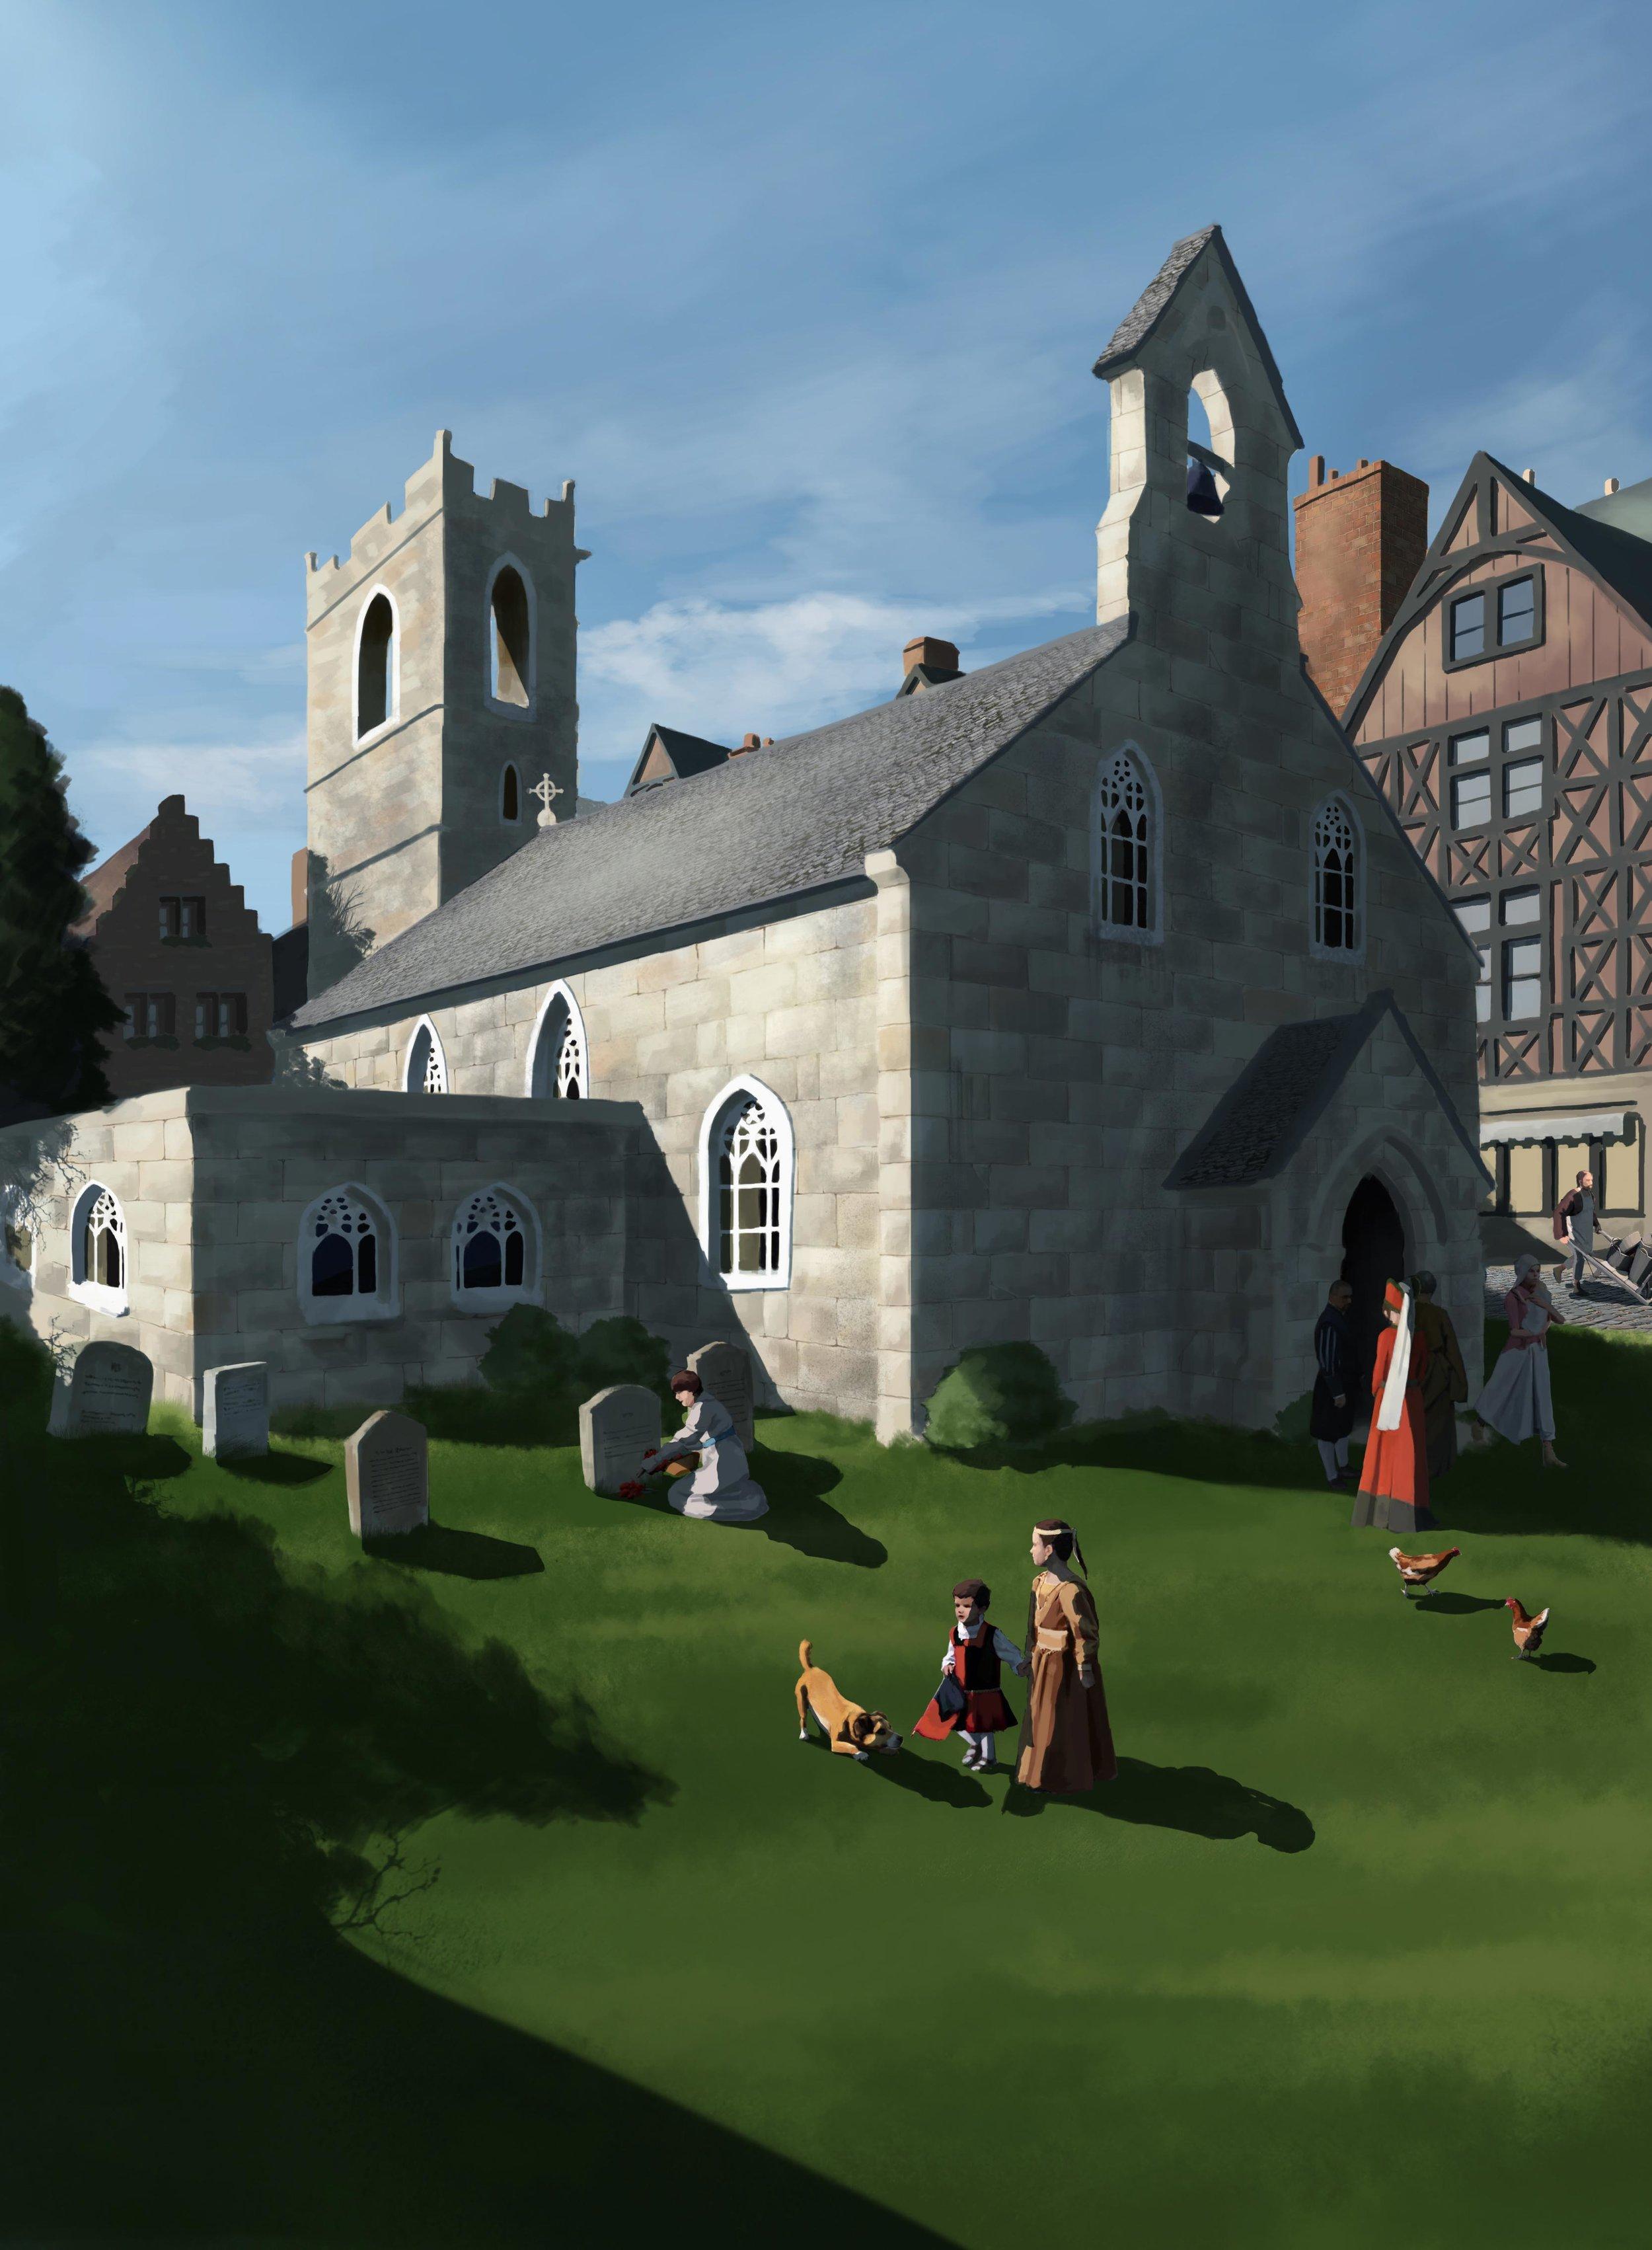 Church_smaller.jpg